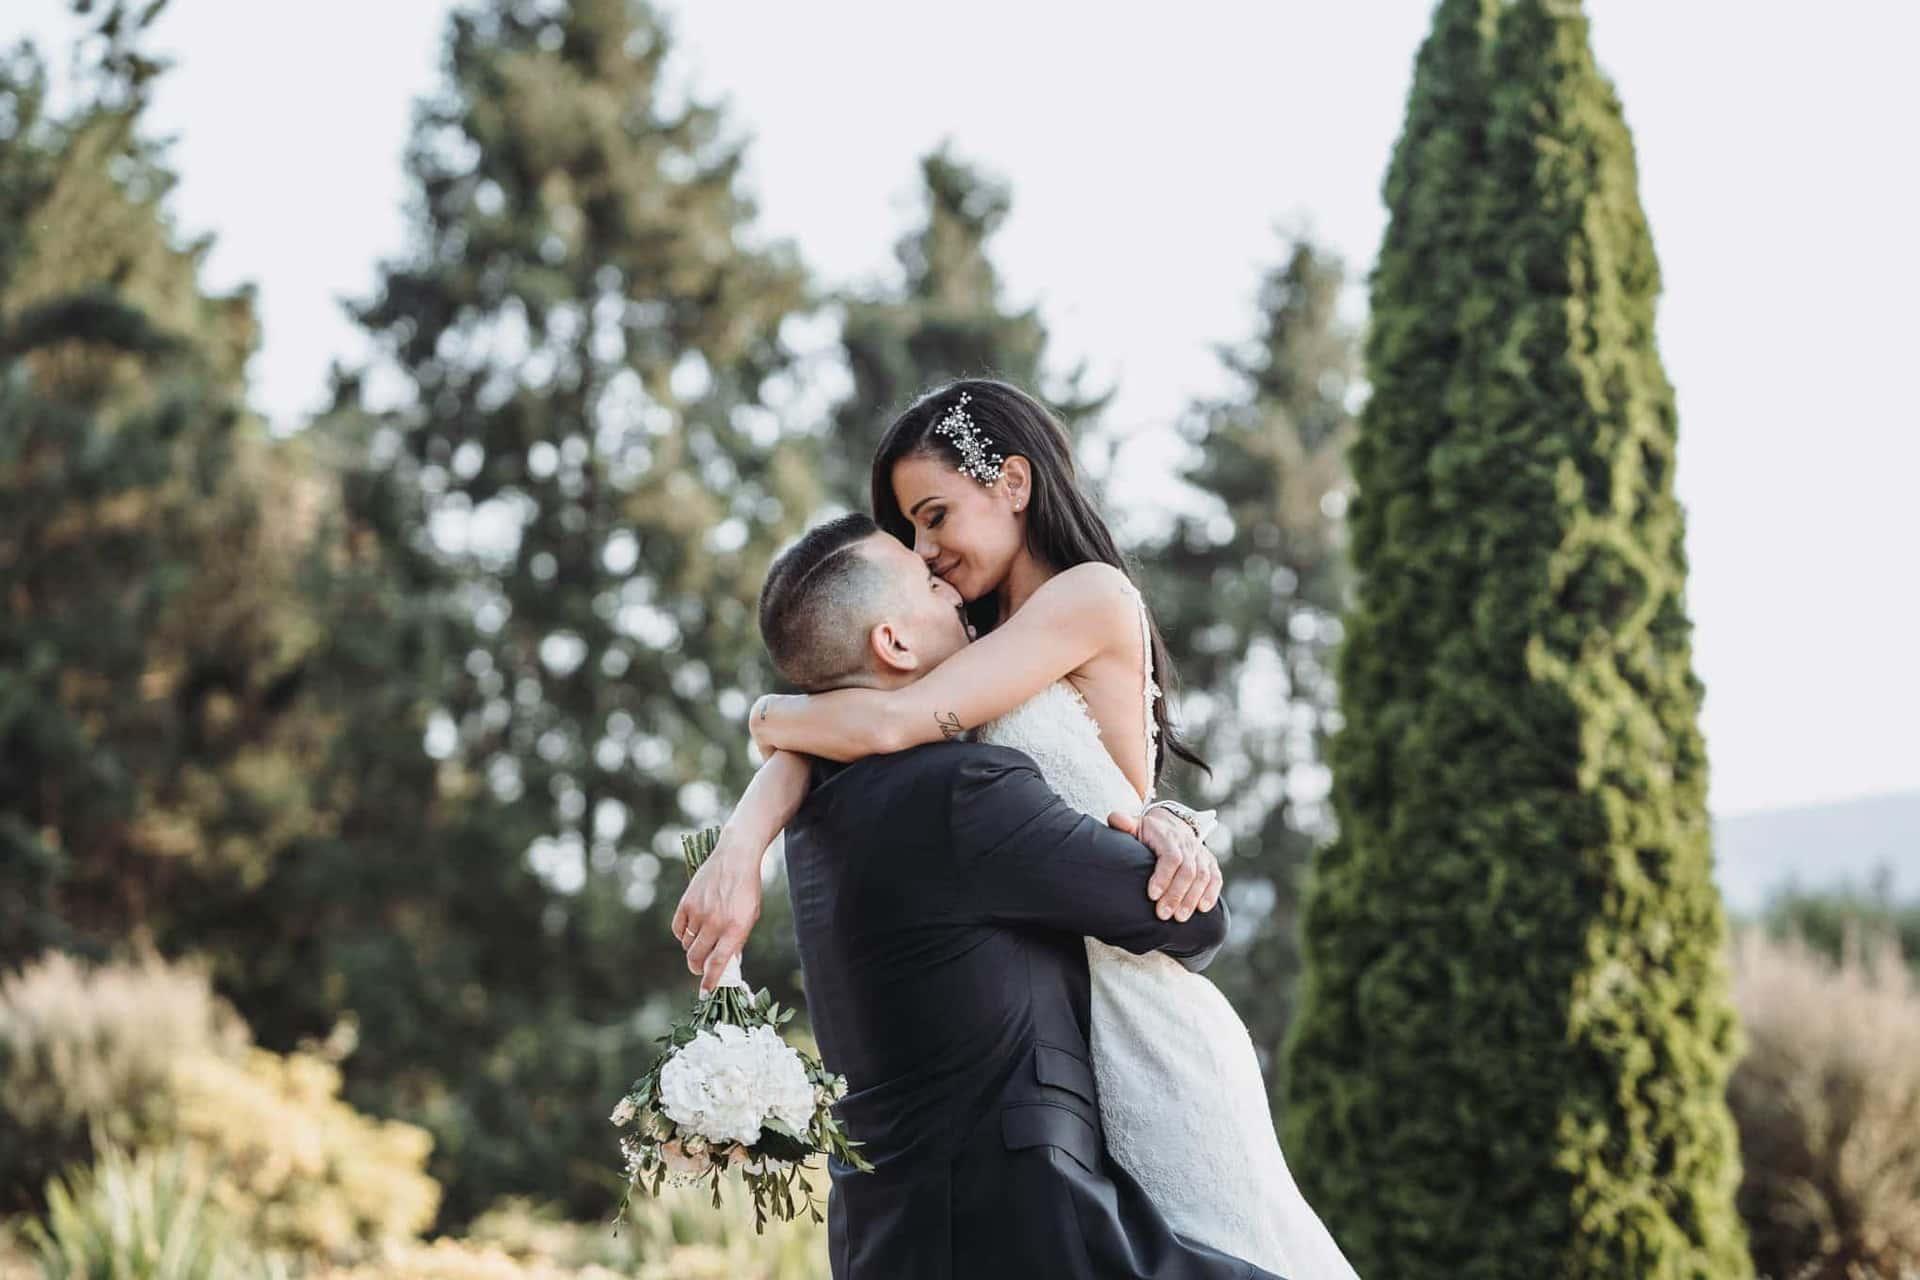 Msanz Weddings Photographer